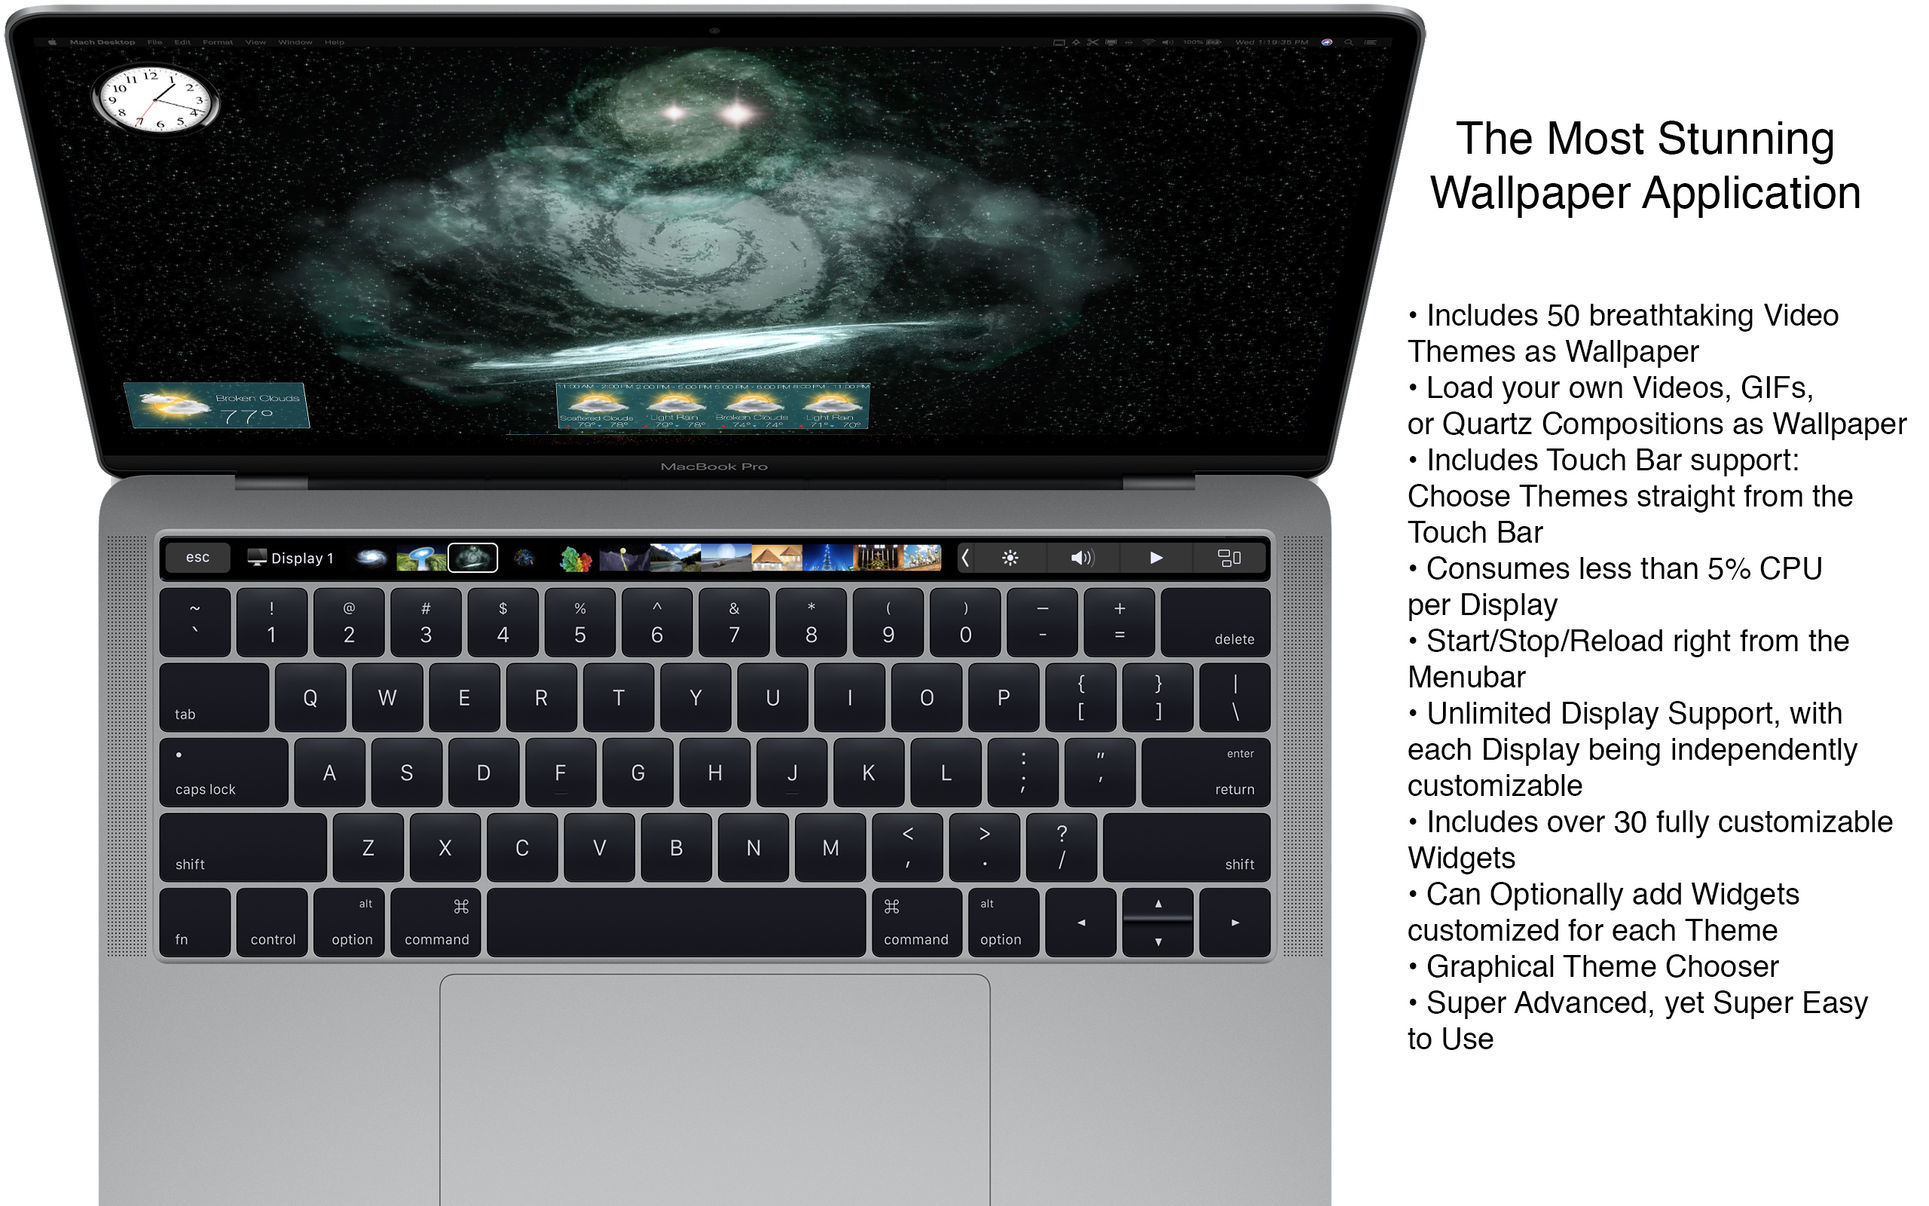 mach desktop 3.0.3 purchase for mac | macupdate